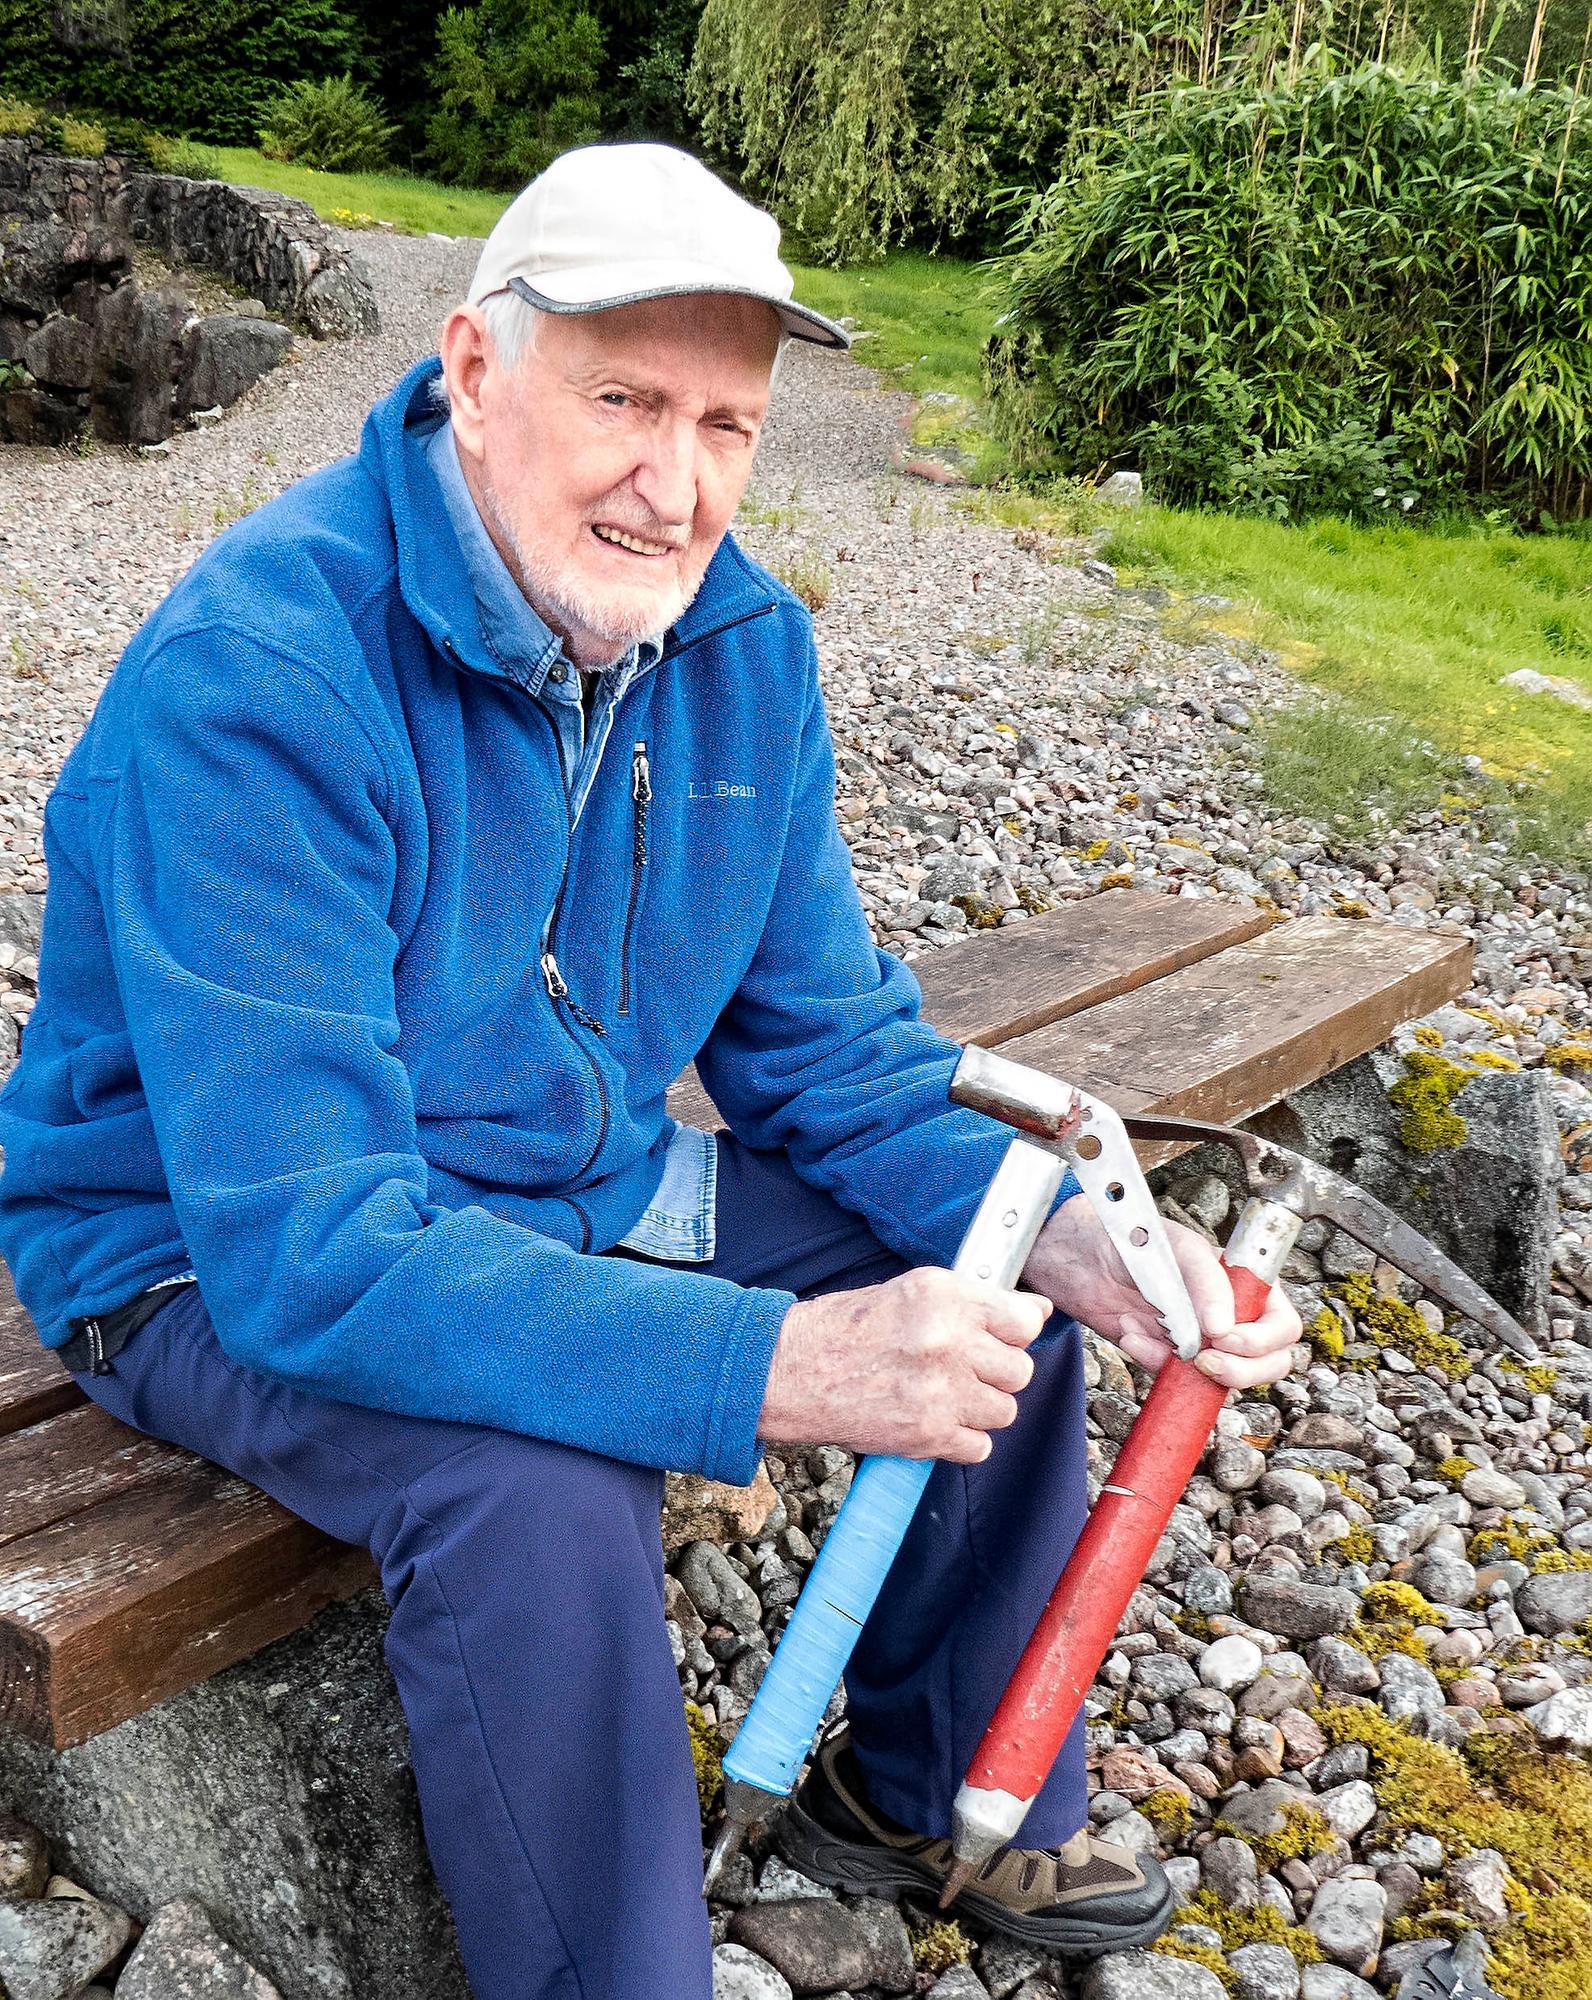 Obituary: Hamish MacInnes, Scottish mountaineer and inventor